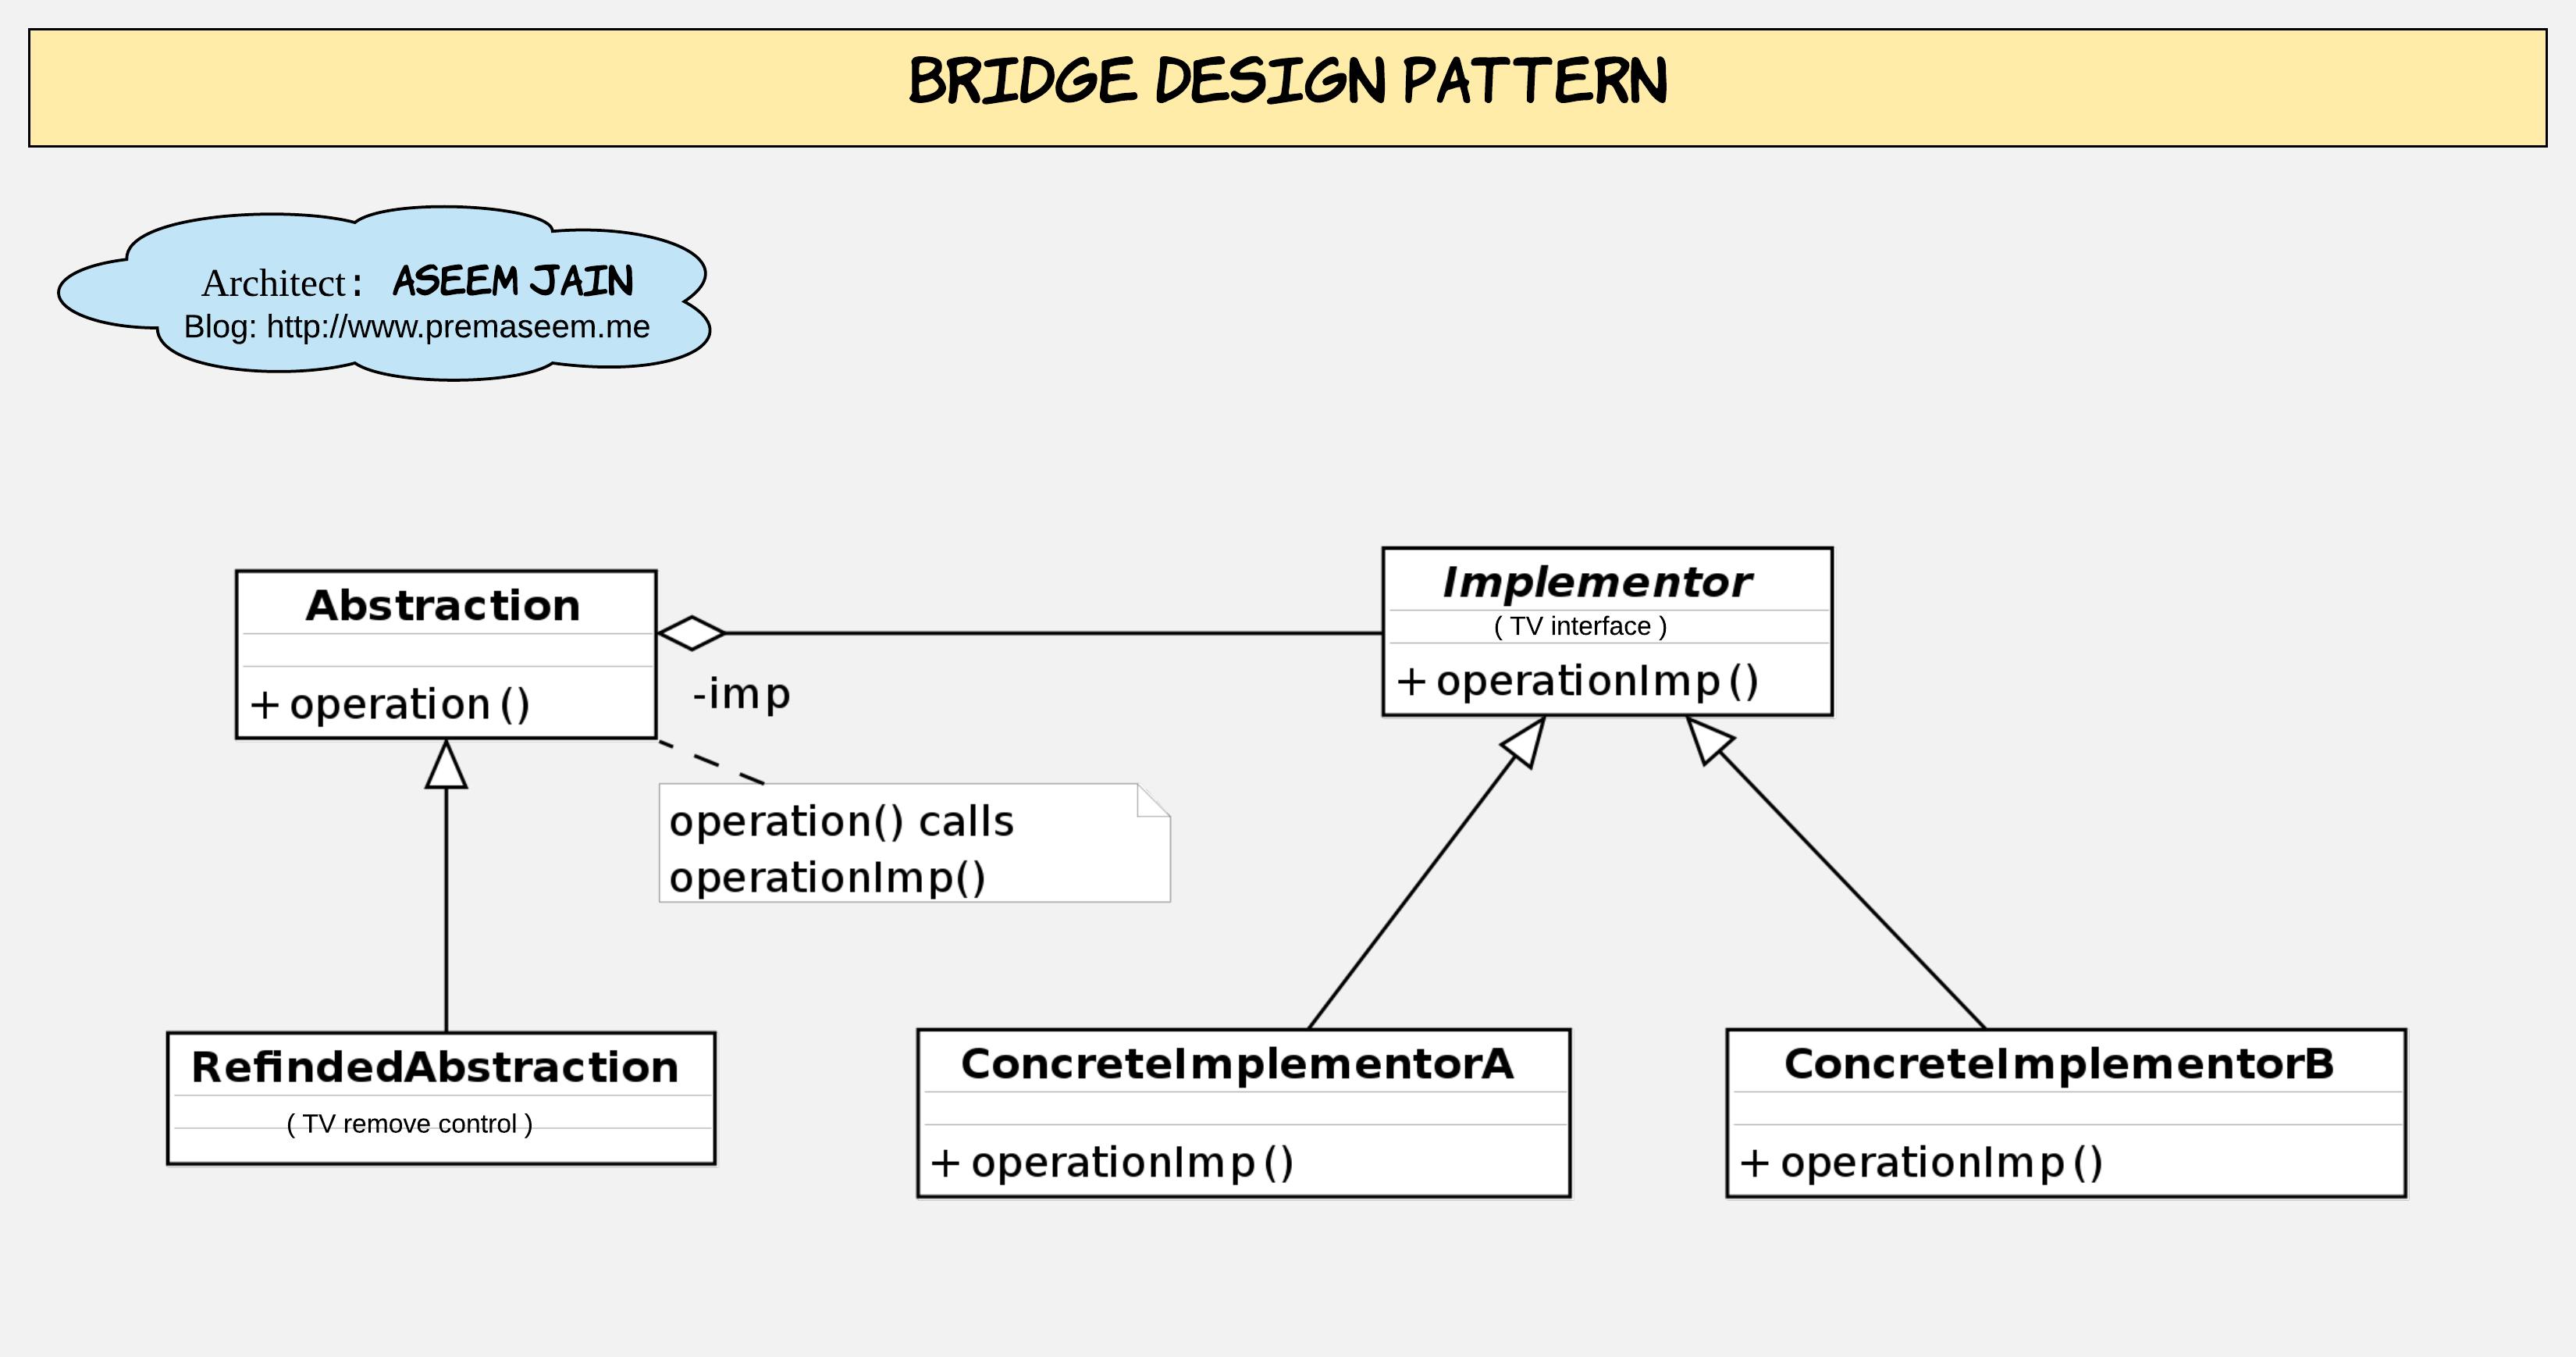 Bridge Design Pattern class diagram.png